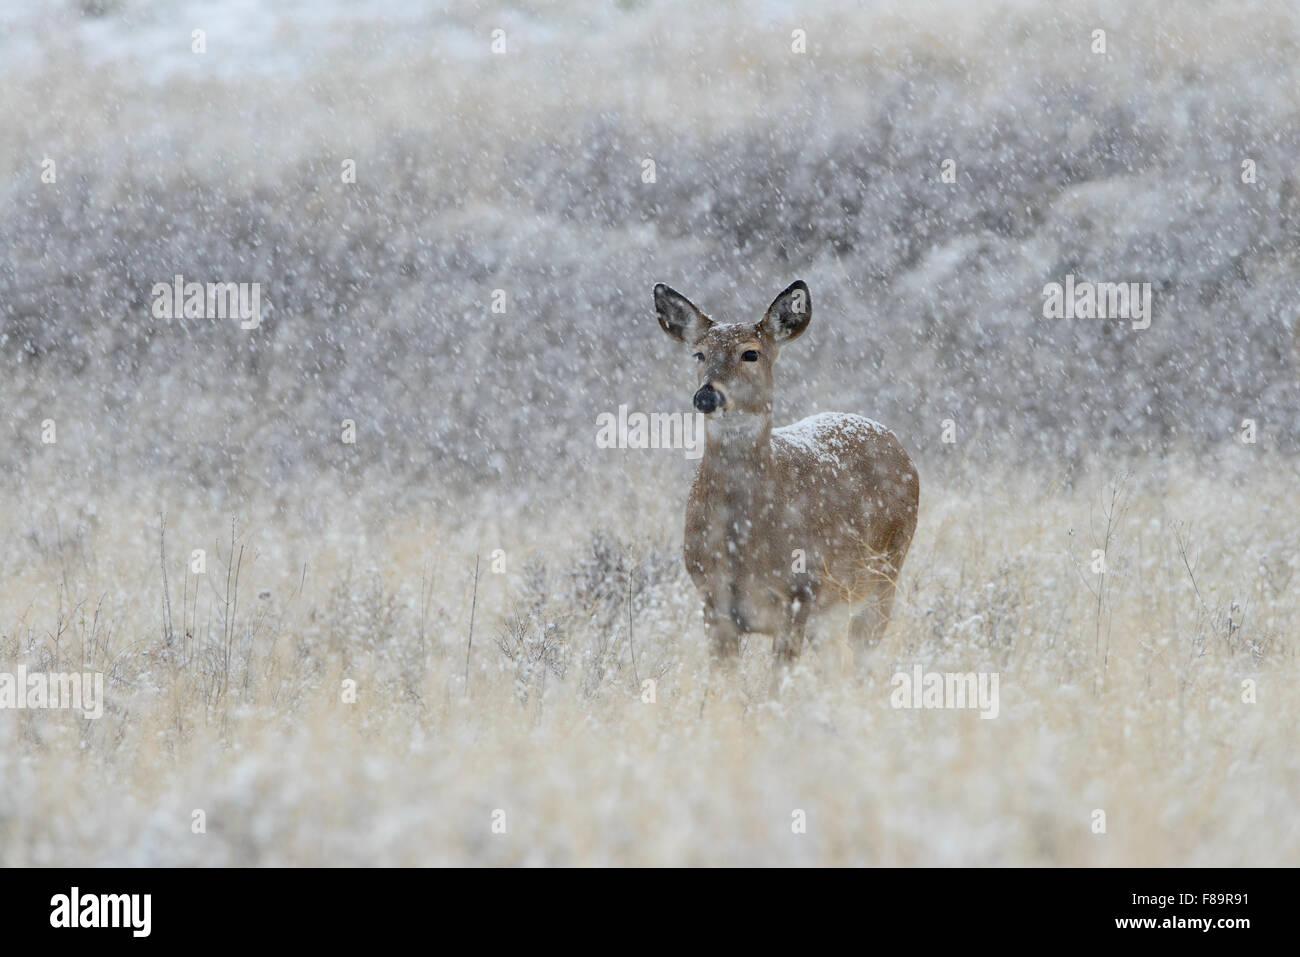 A white-tailed doe endures an Autumn snowfall, Western US - Stock Image